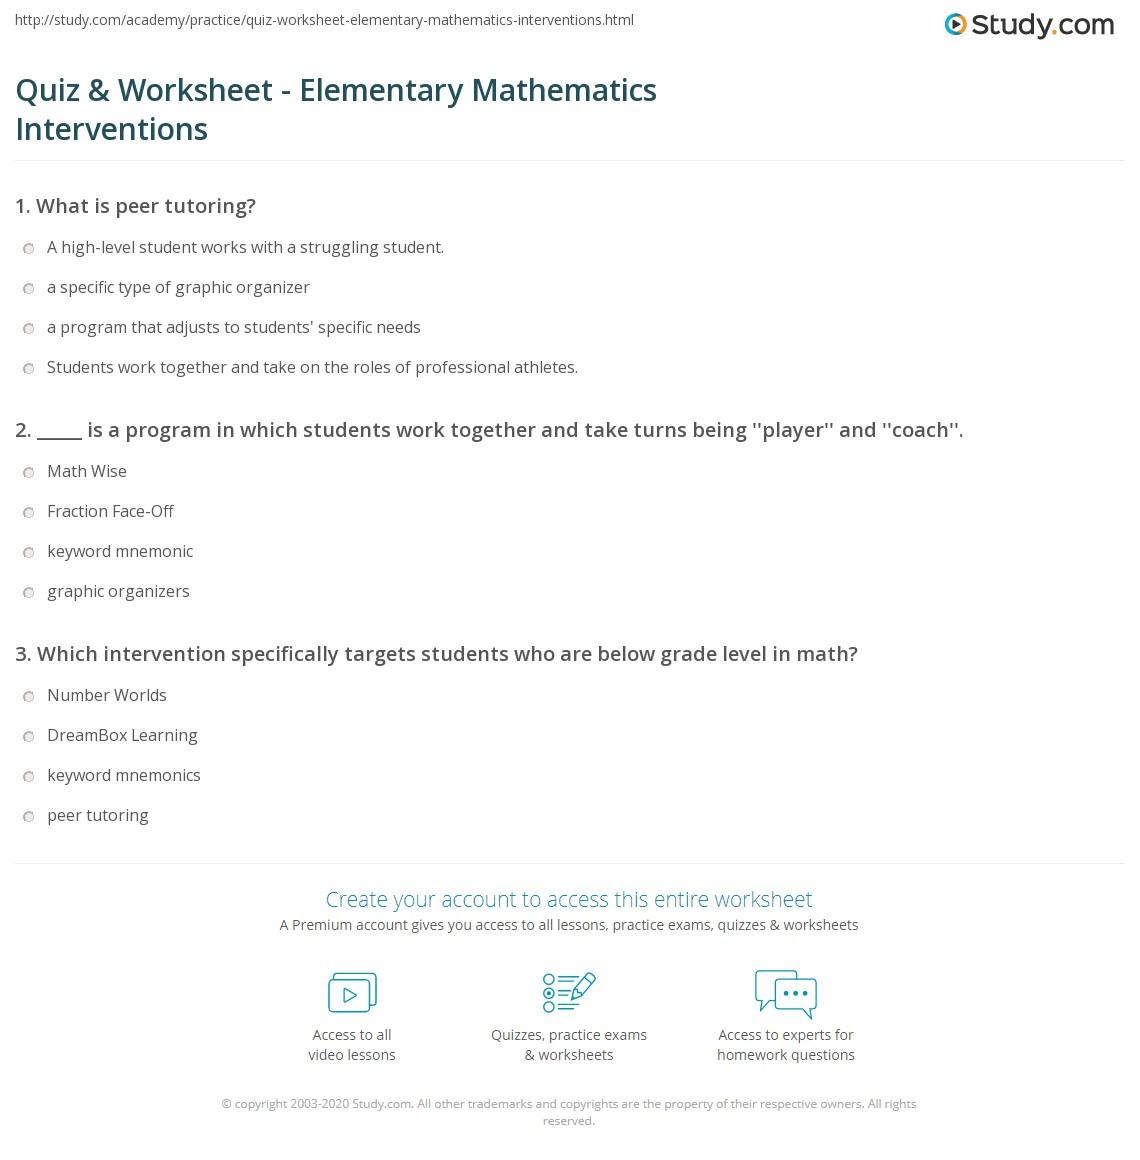 Worksheets Math Intervention Worksheets quiz worksheet elementary mathematics interventions study com print math intervention strategies for students worksheet